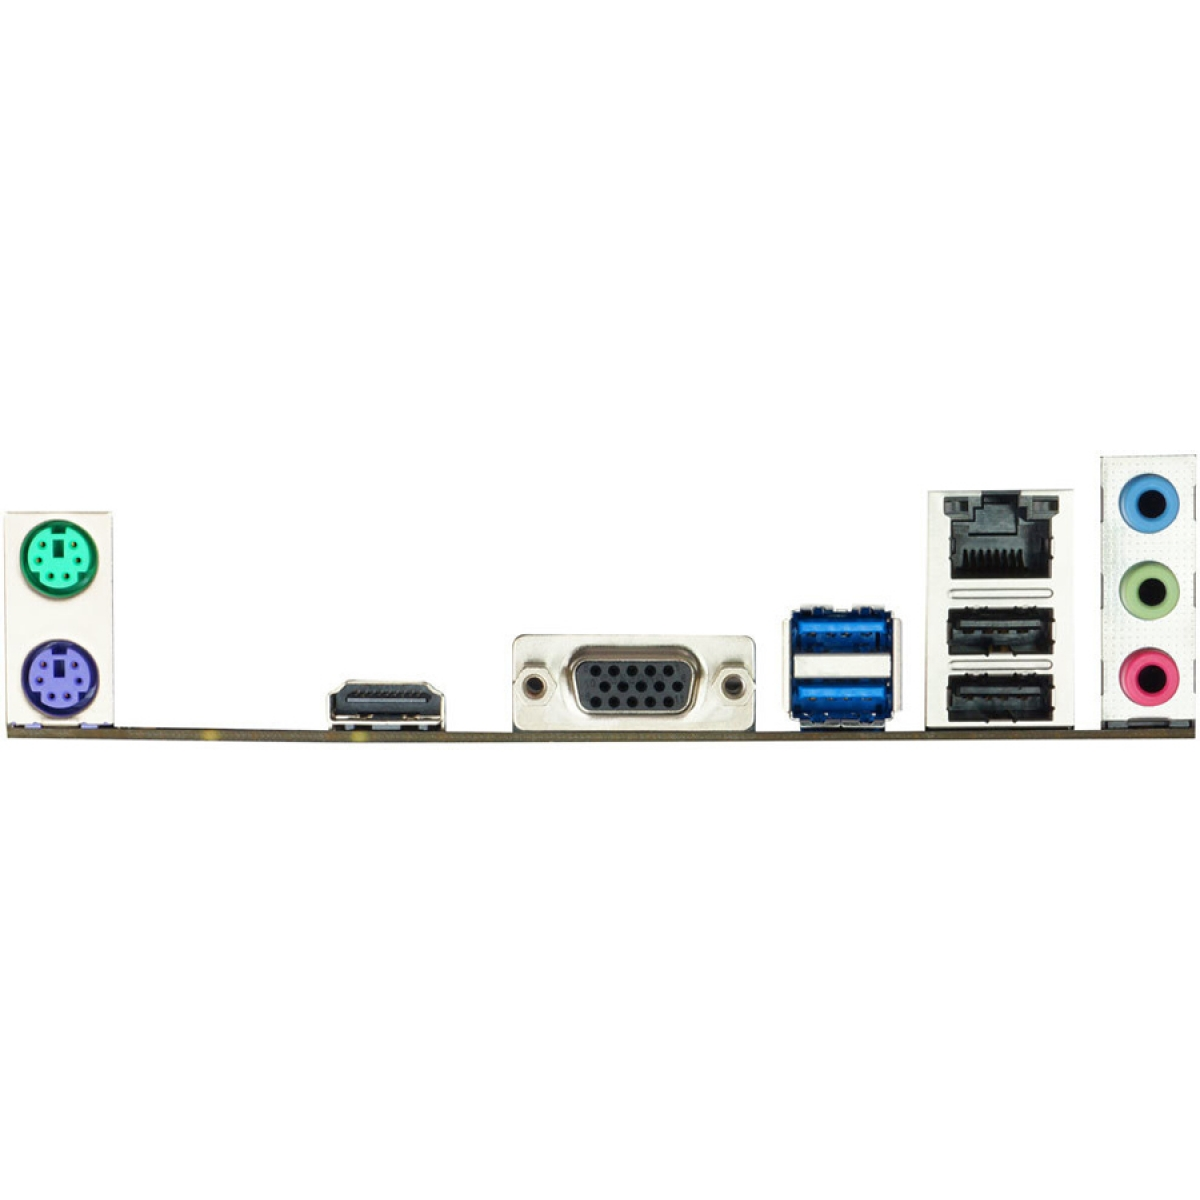 Placa Mãe Biostar H110MH PRO D4, Chipset H110, Intel LGA 1151, mATX, DDR4